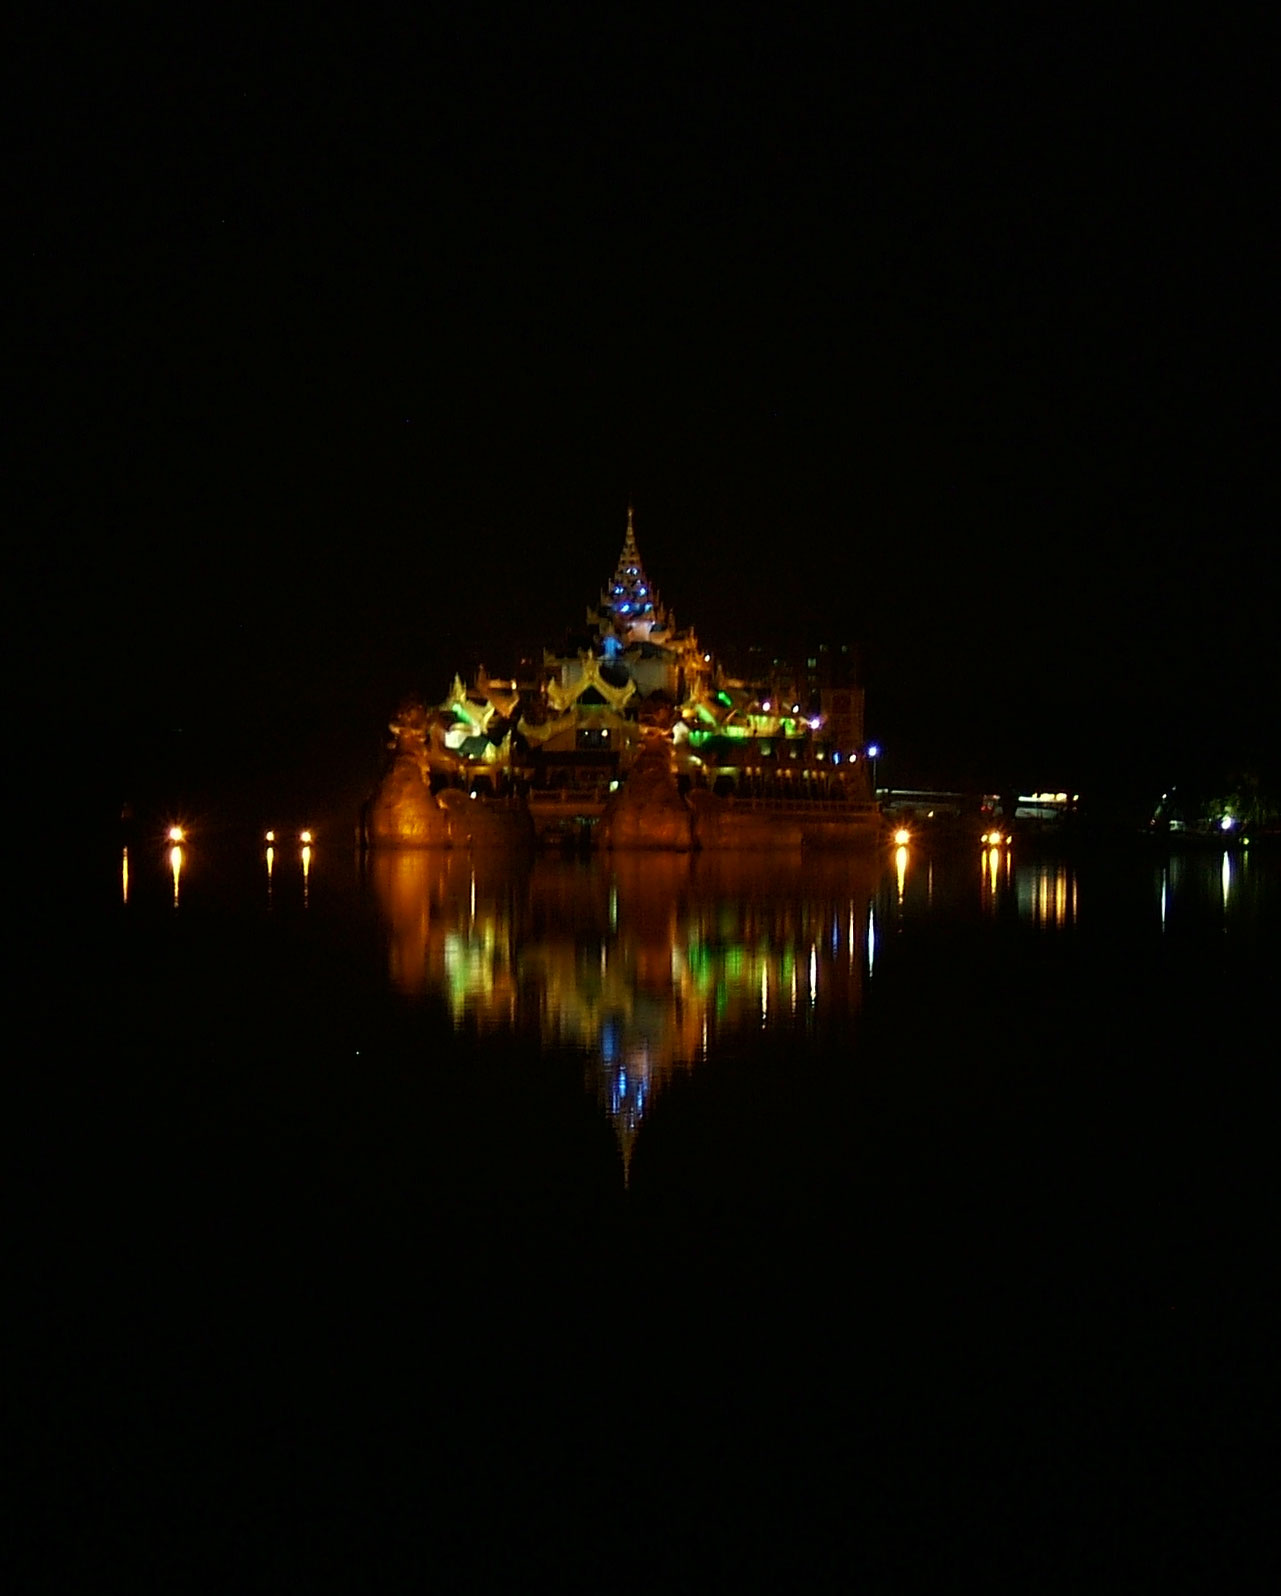 Myanmar Yangon Kandawgyi Palace Hotel royal barge Nov 2004 17